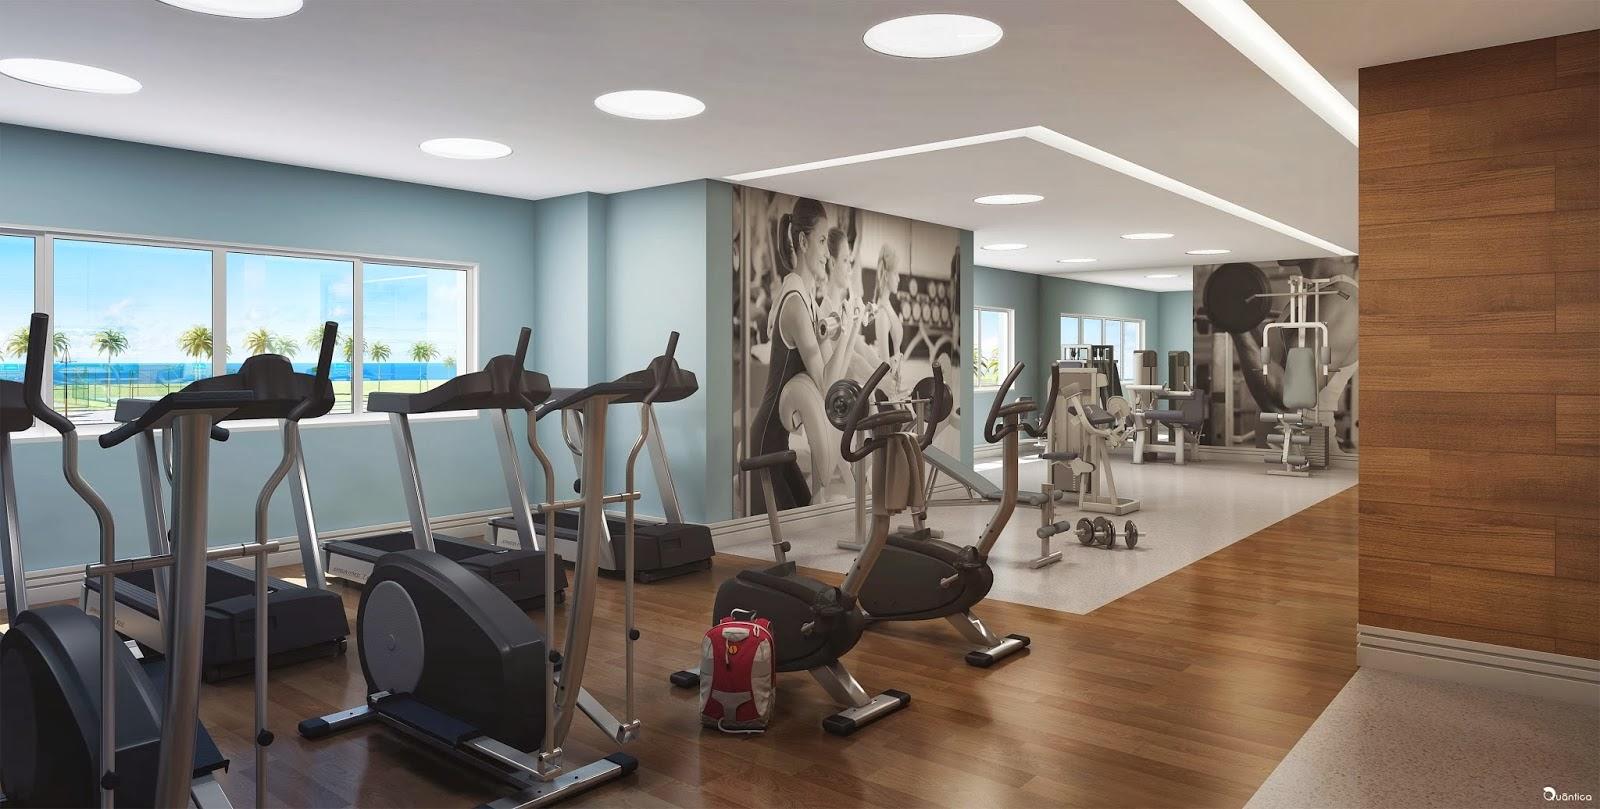 verano residencial - fitness